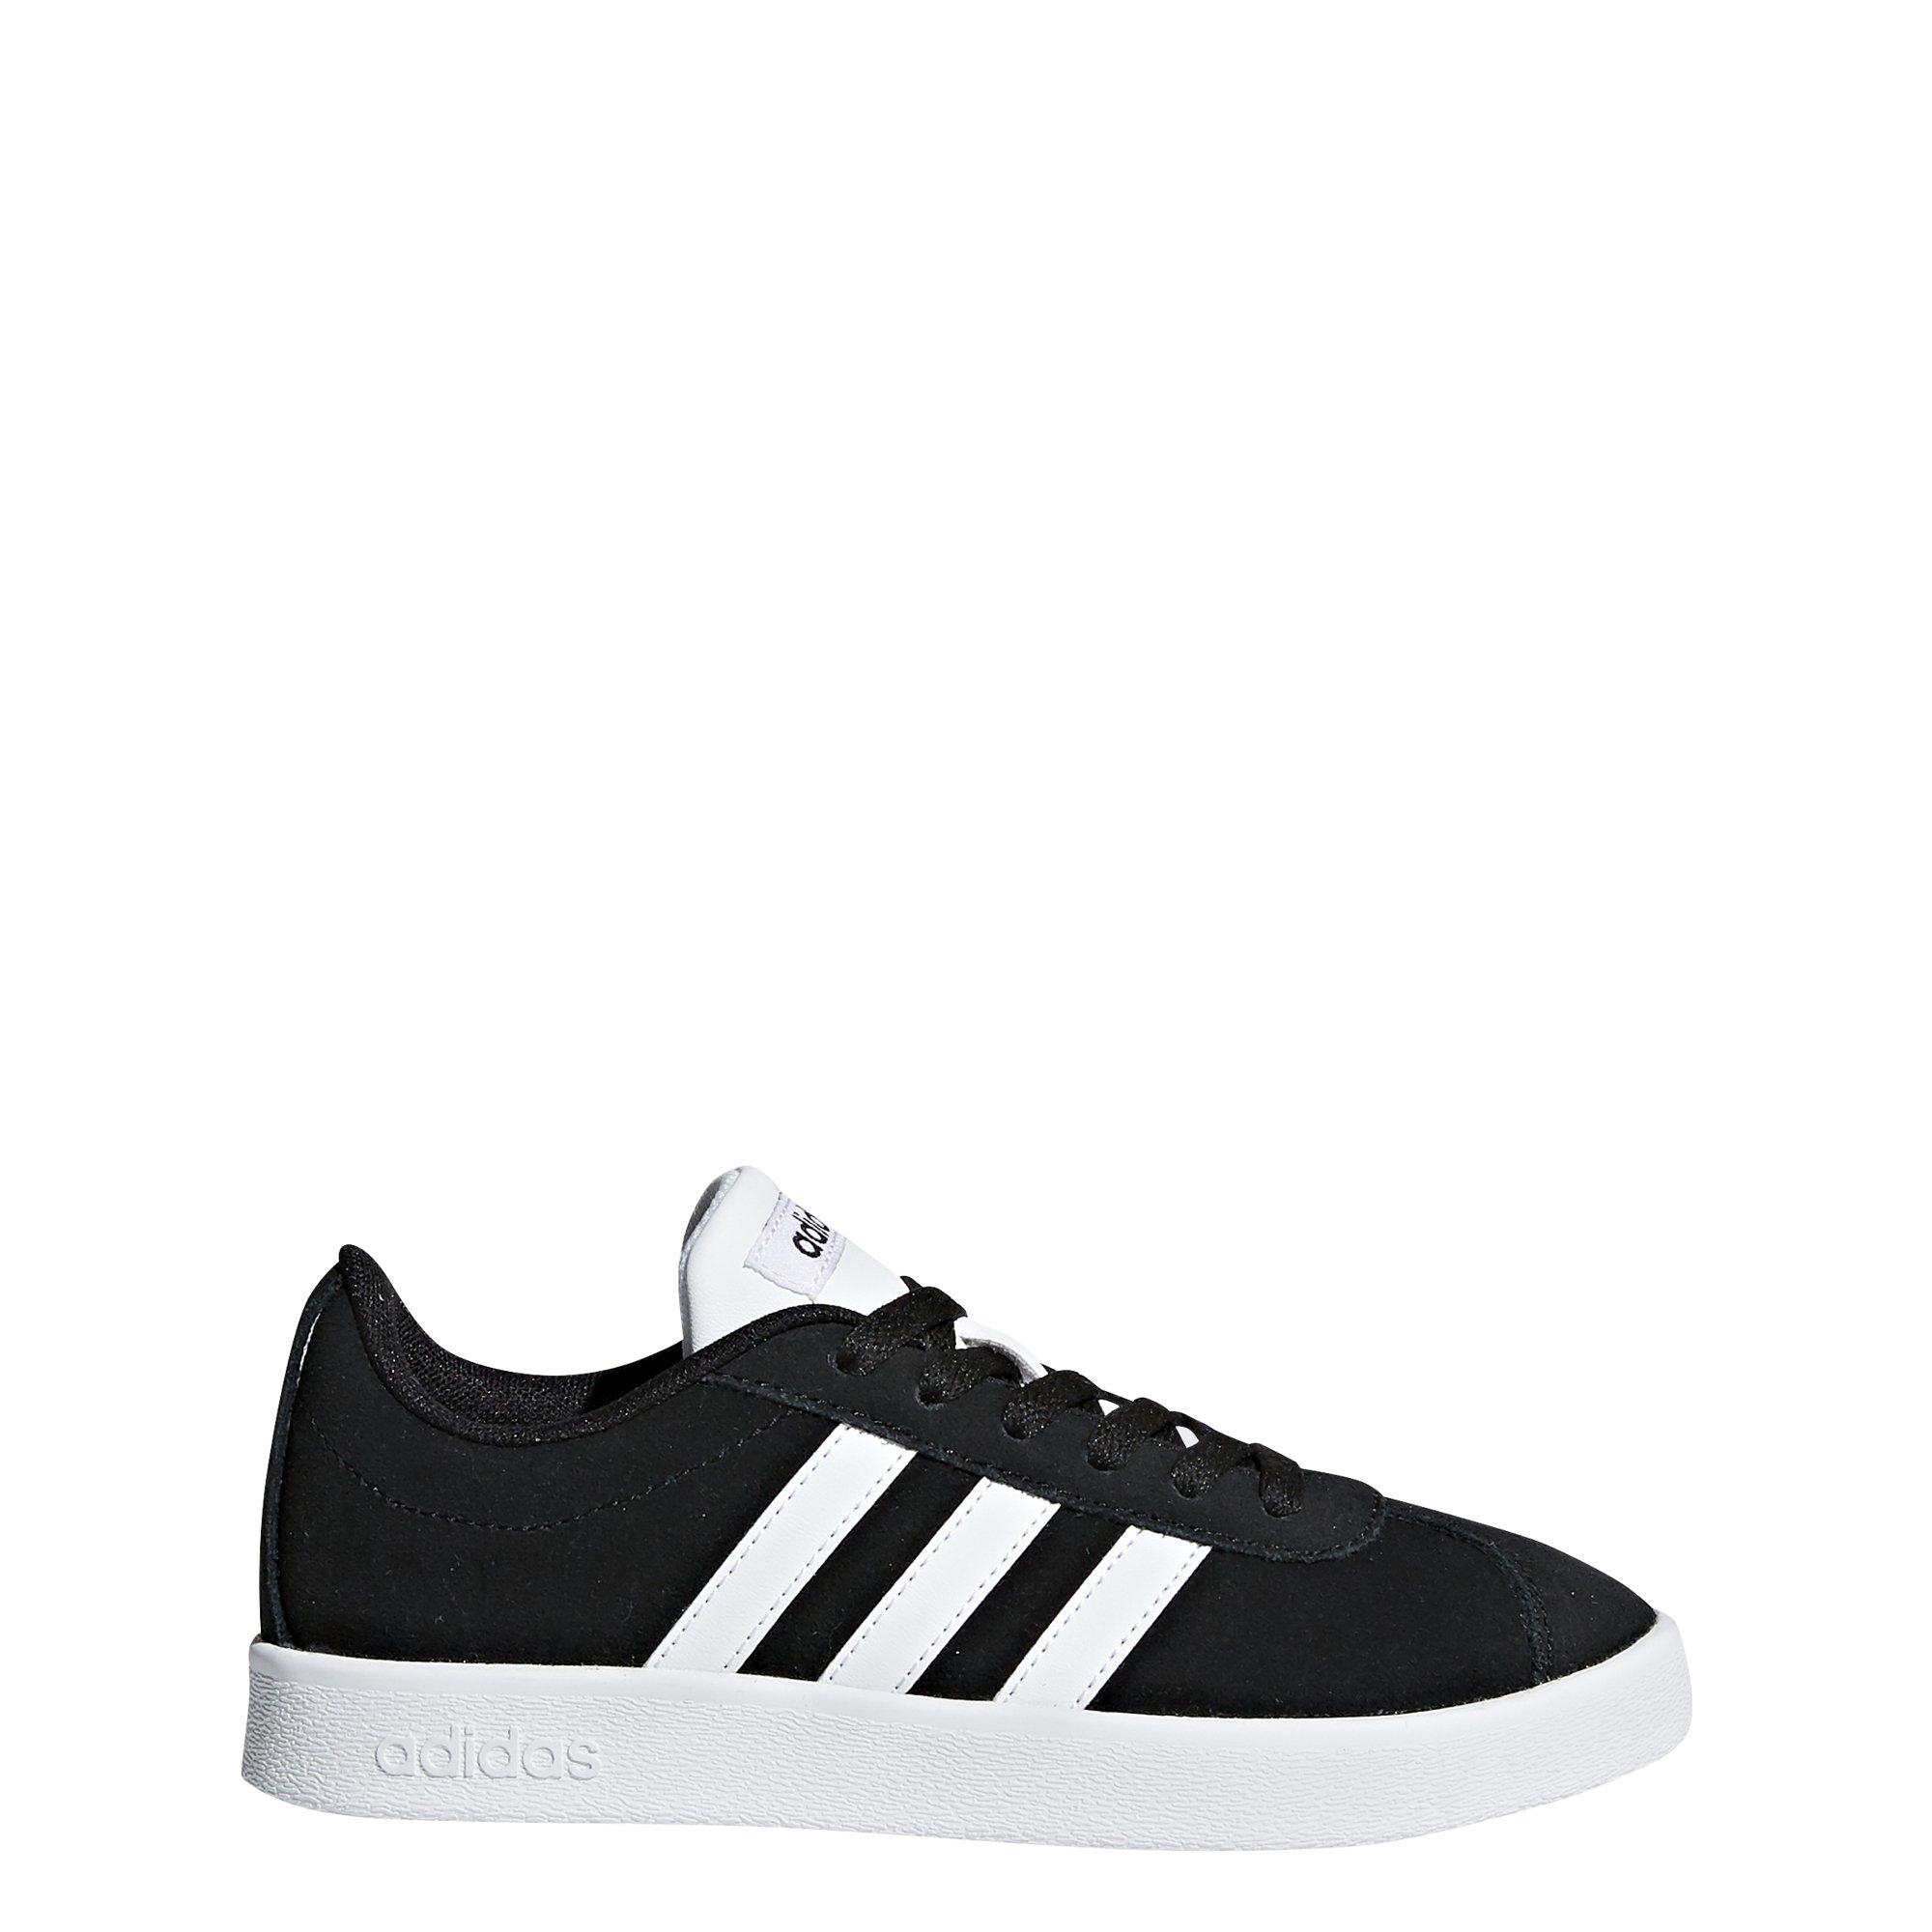 adidas Kids' VL Court 2.0, Core Black/White/Core Black, 1 M US Little Kid